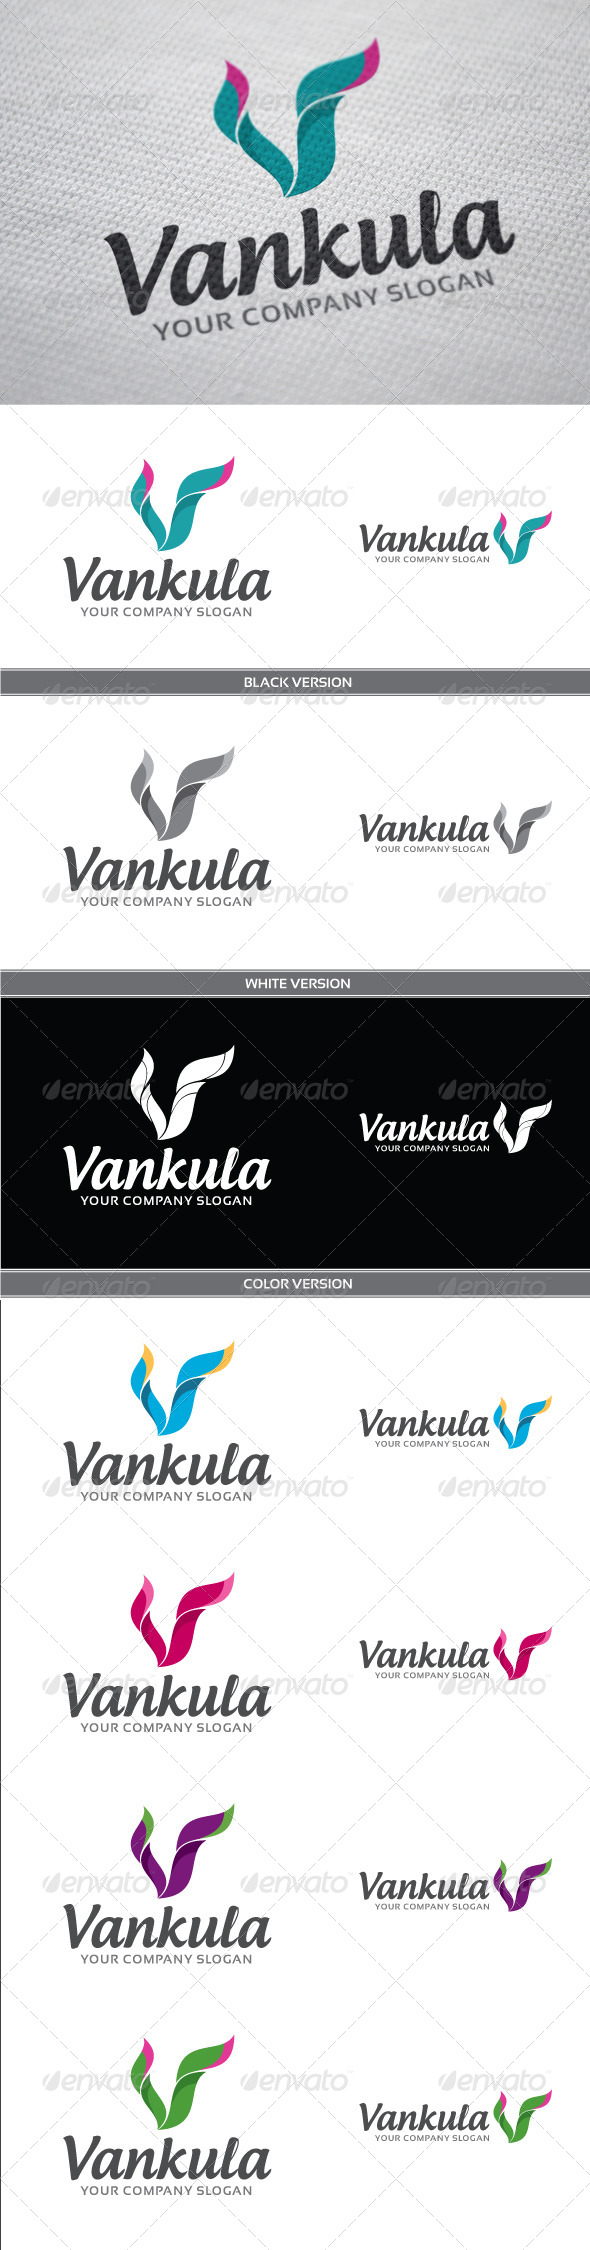 GraphicRiver Vankula 4134421